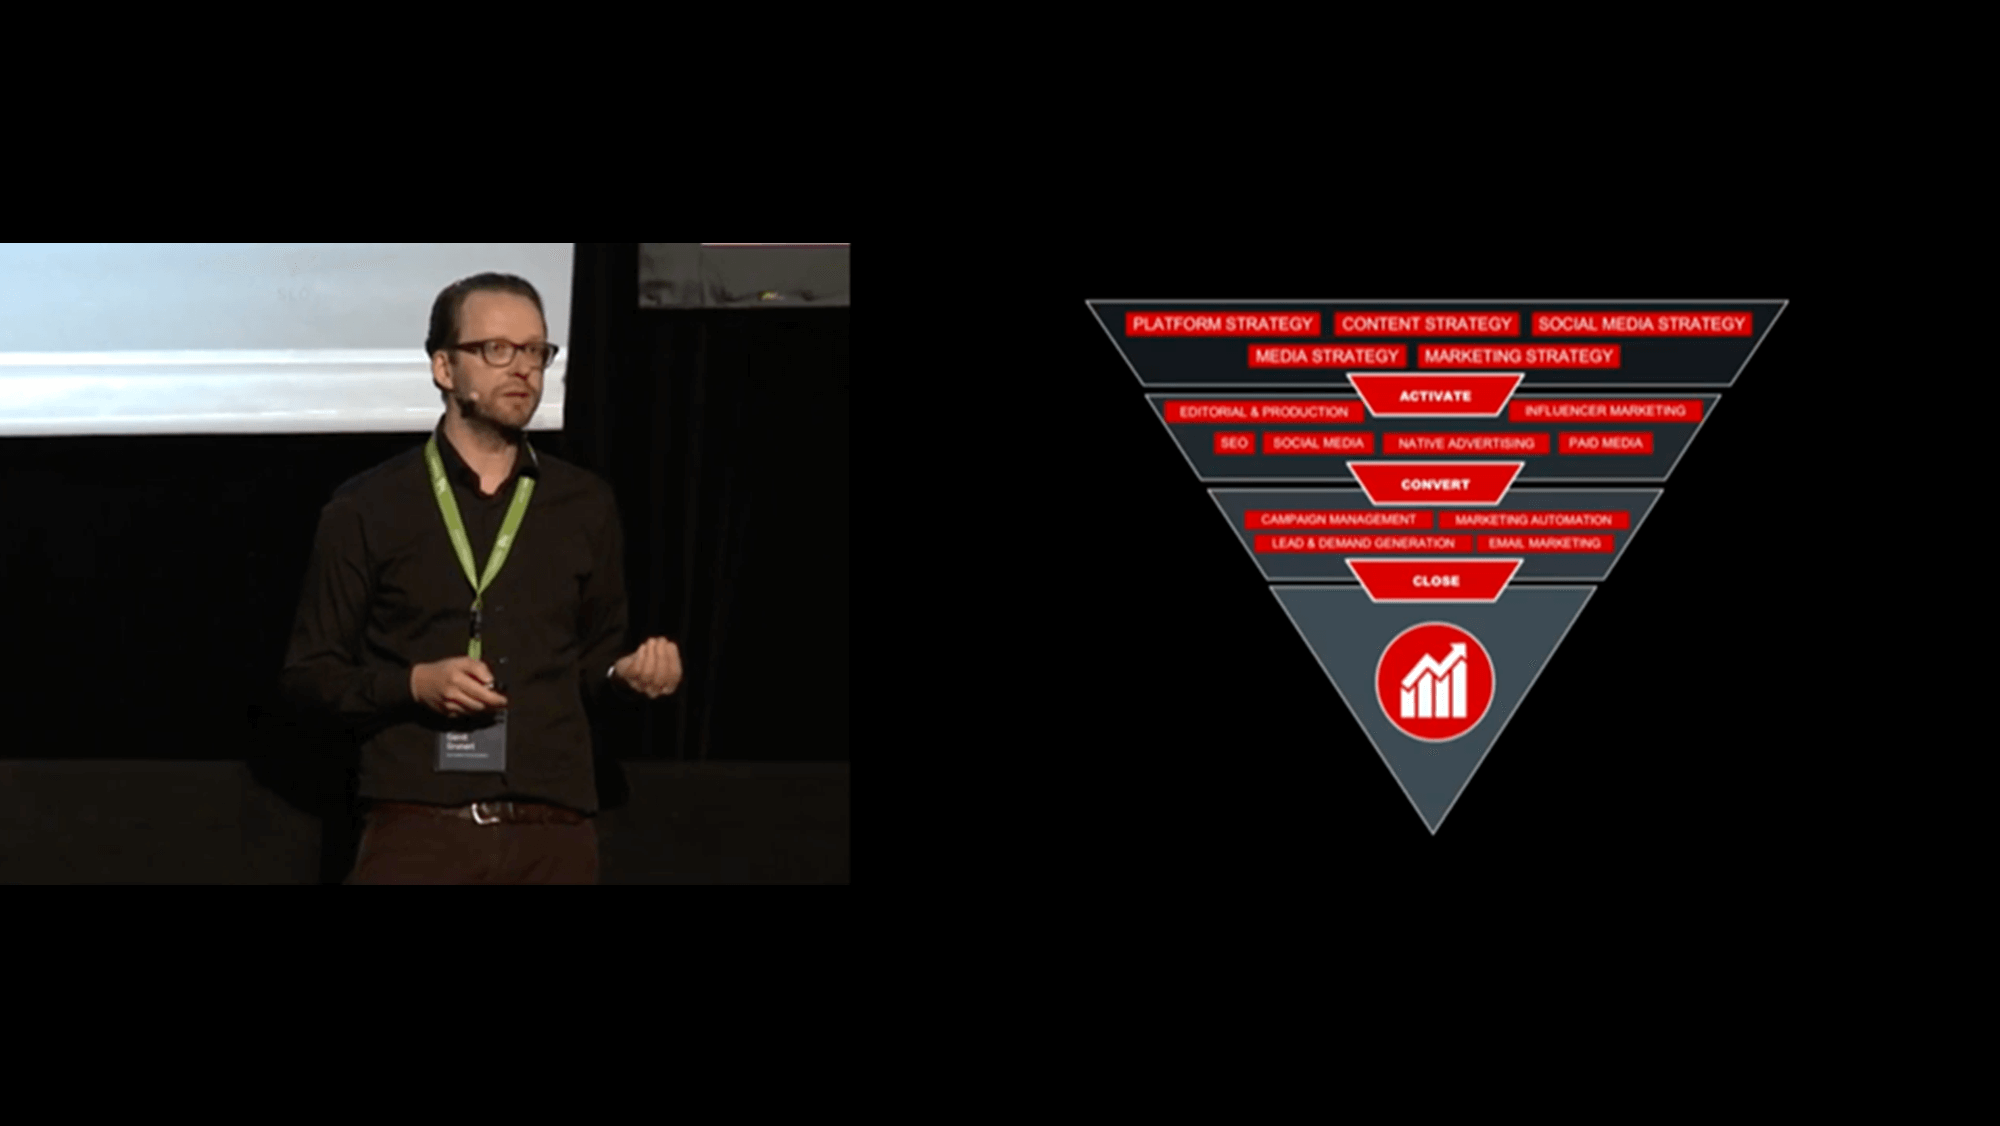 searchmetrics-summit-2017-gerrit-grunert-crispy-content-hero